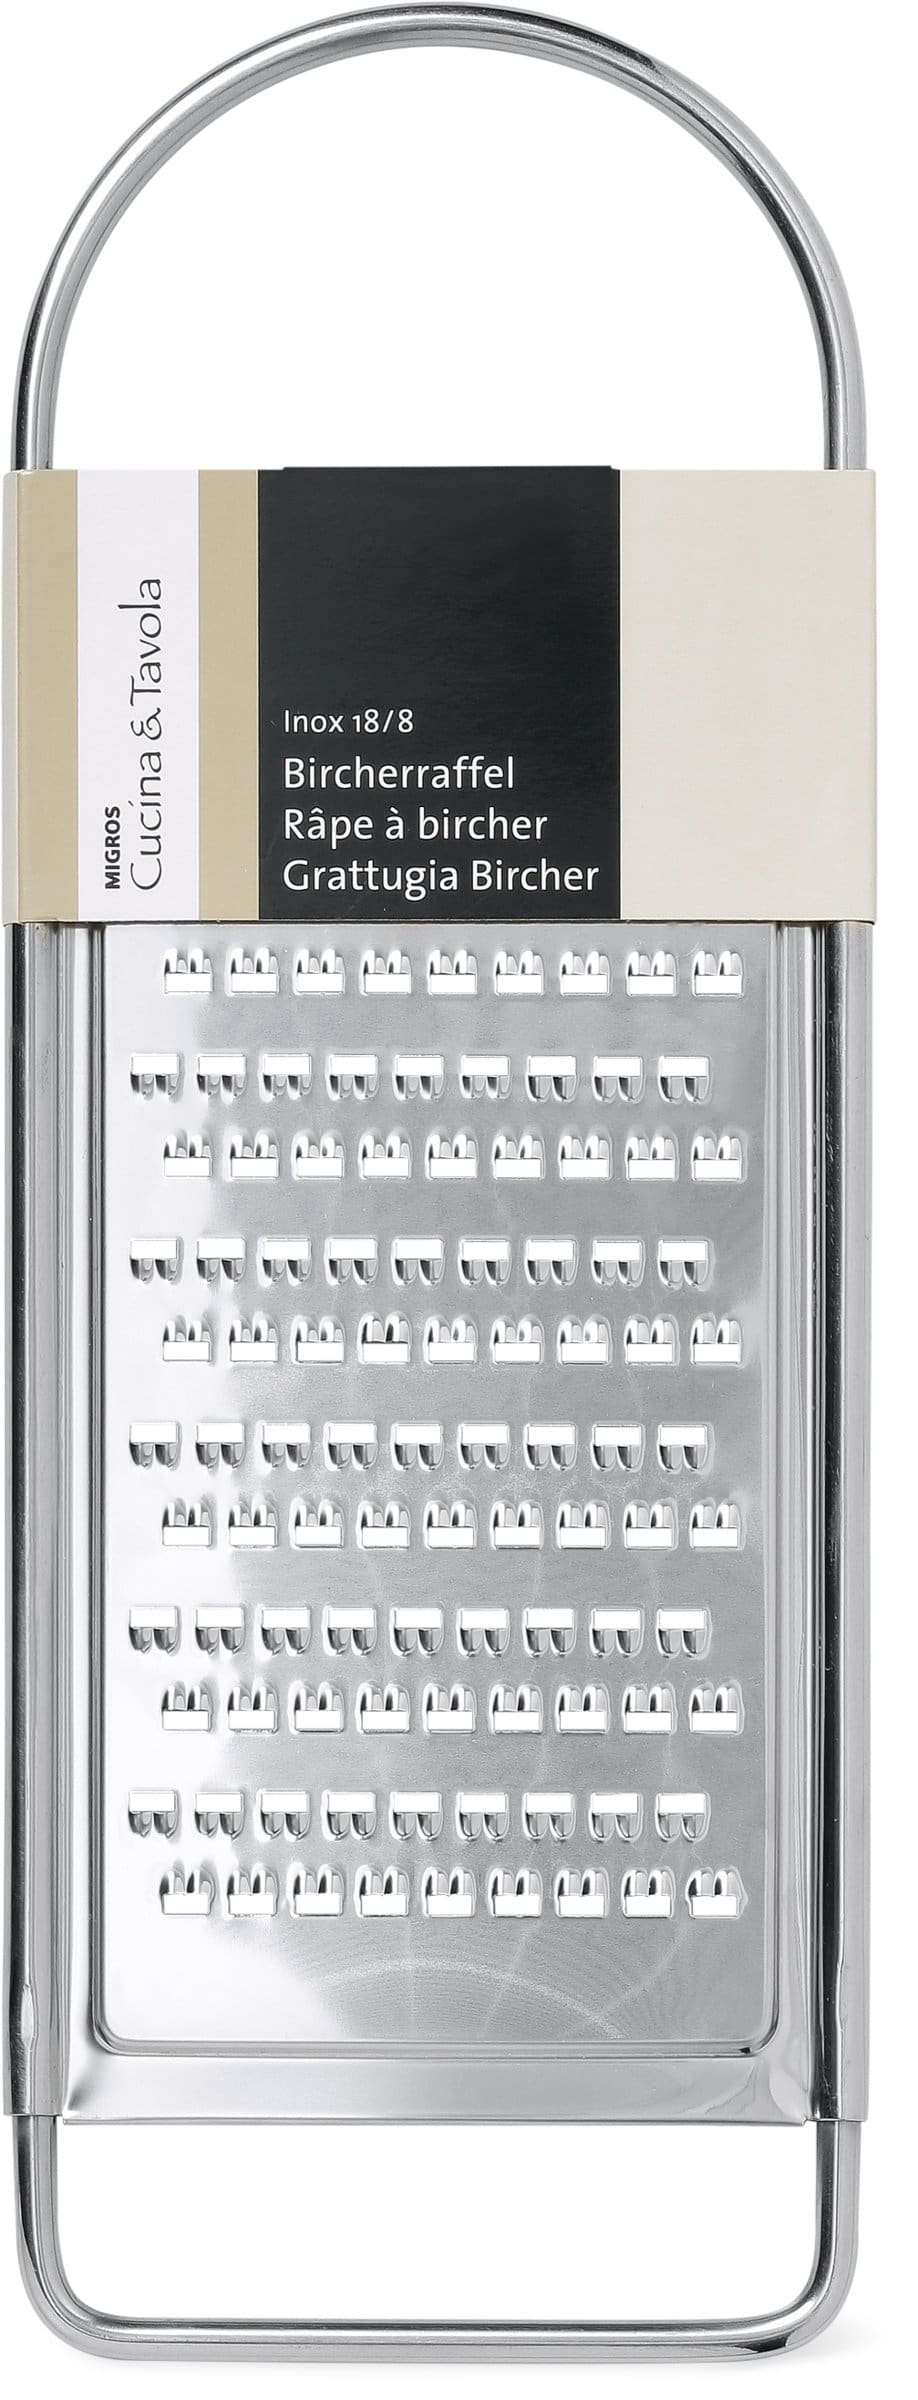 Cucina & Tavola Bircherraffel